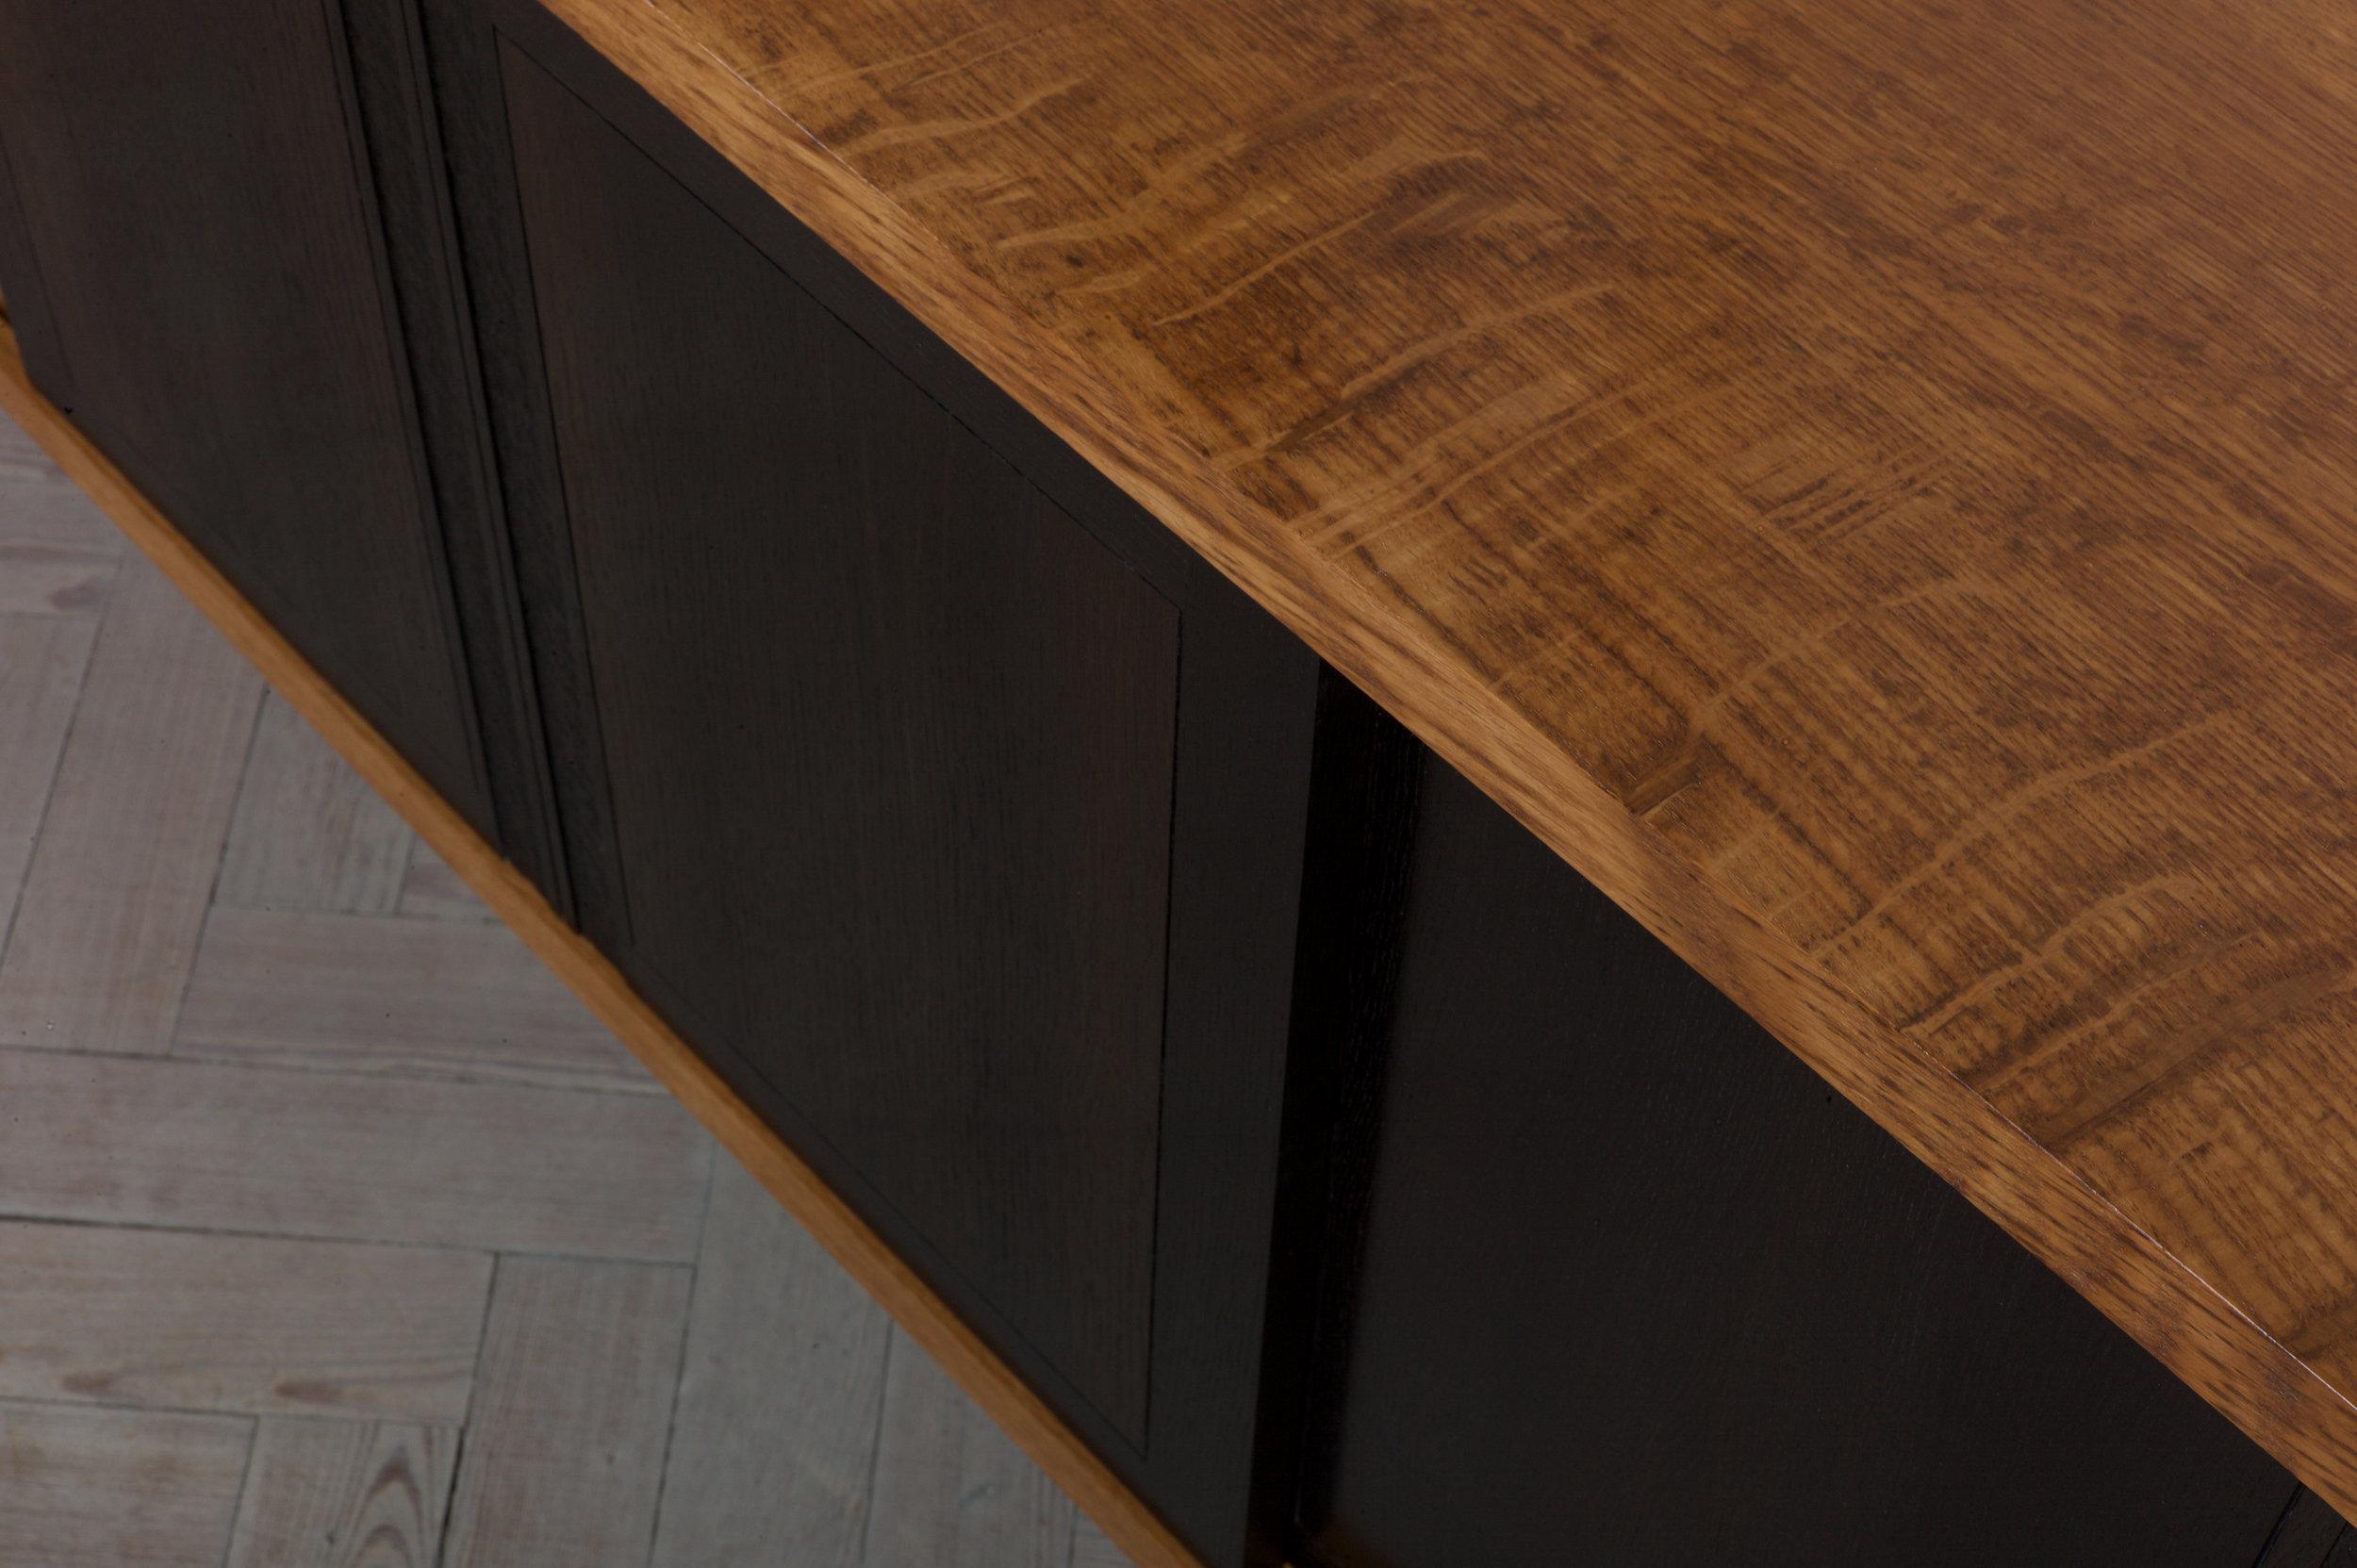 Petrel furniture sideboard in English brown oak and bog oak